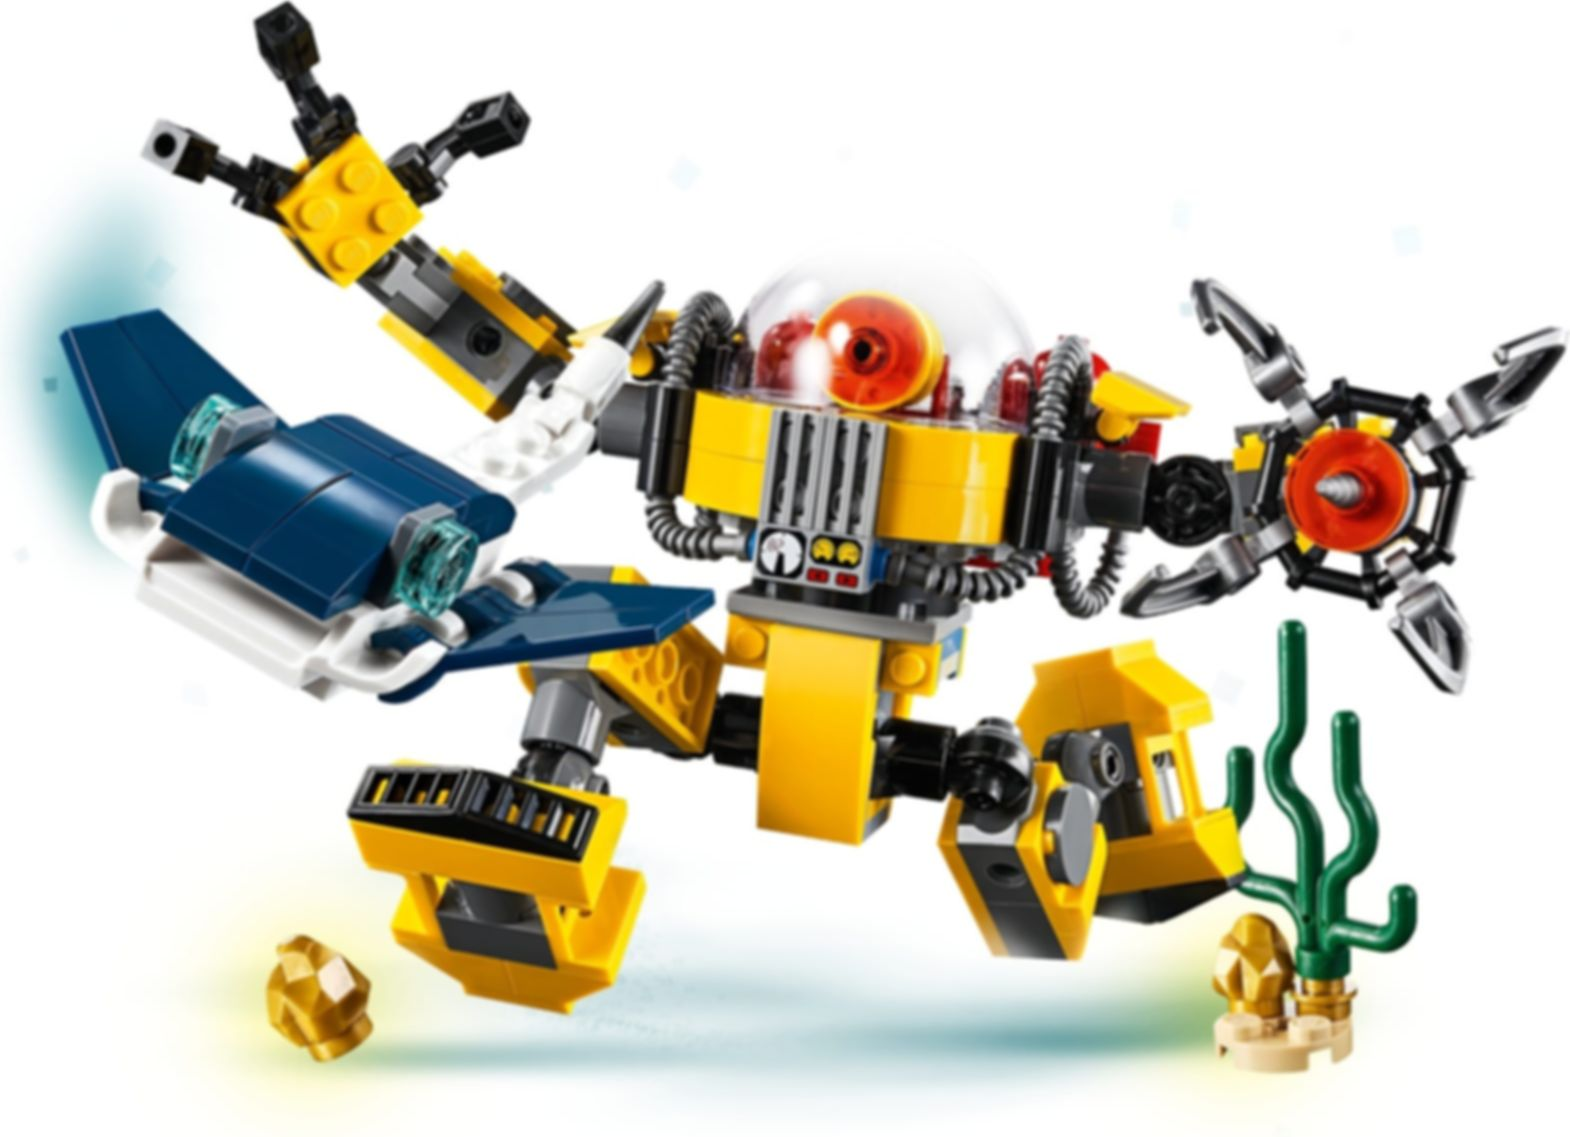 Underwater Robot gameplay